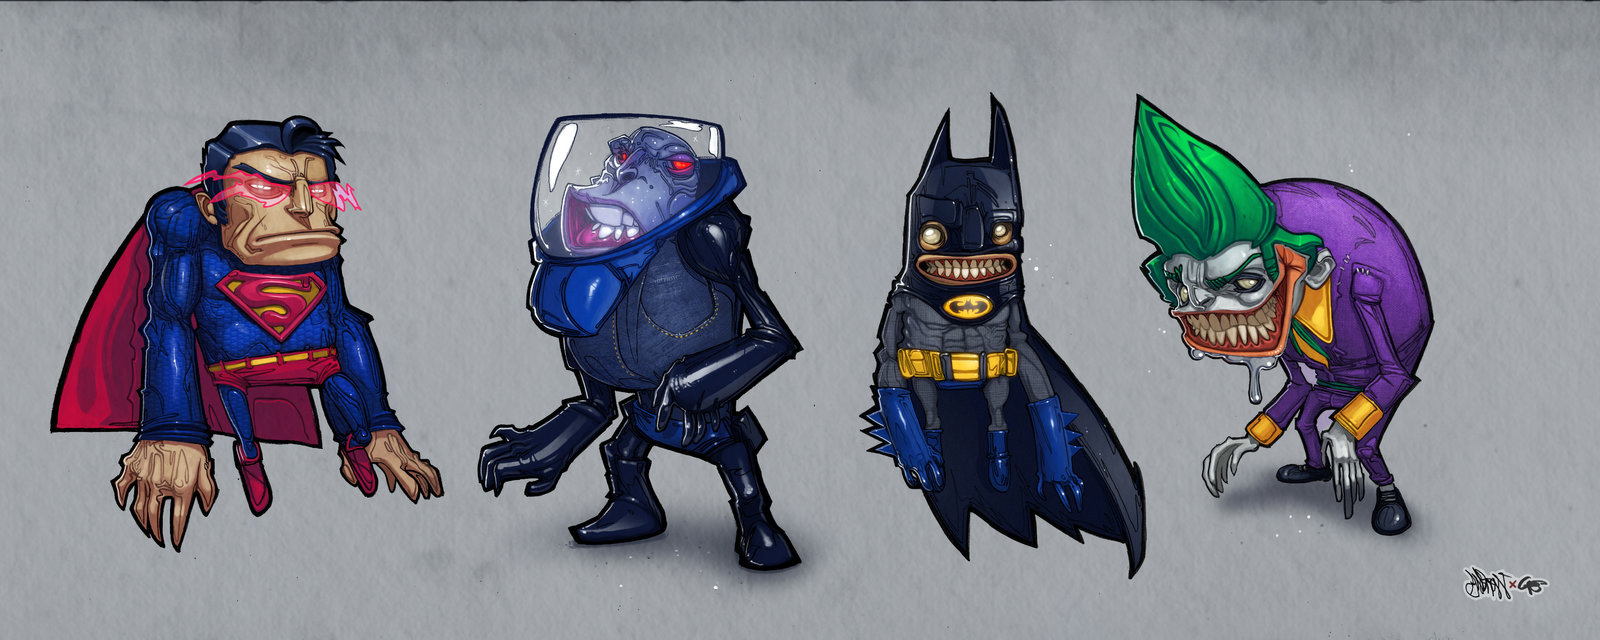 Drawings and Paintings - Pop Art #batman #charactersheet #dc4 #freeze #joker #superman #gambear1er